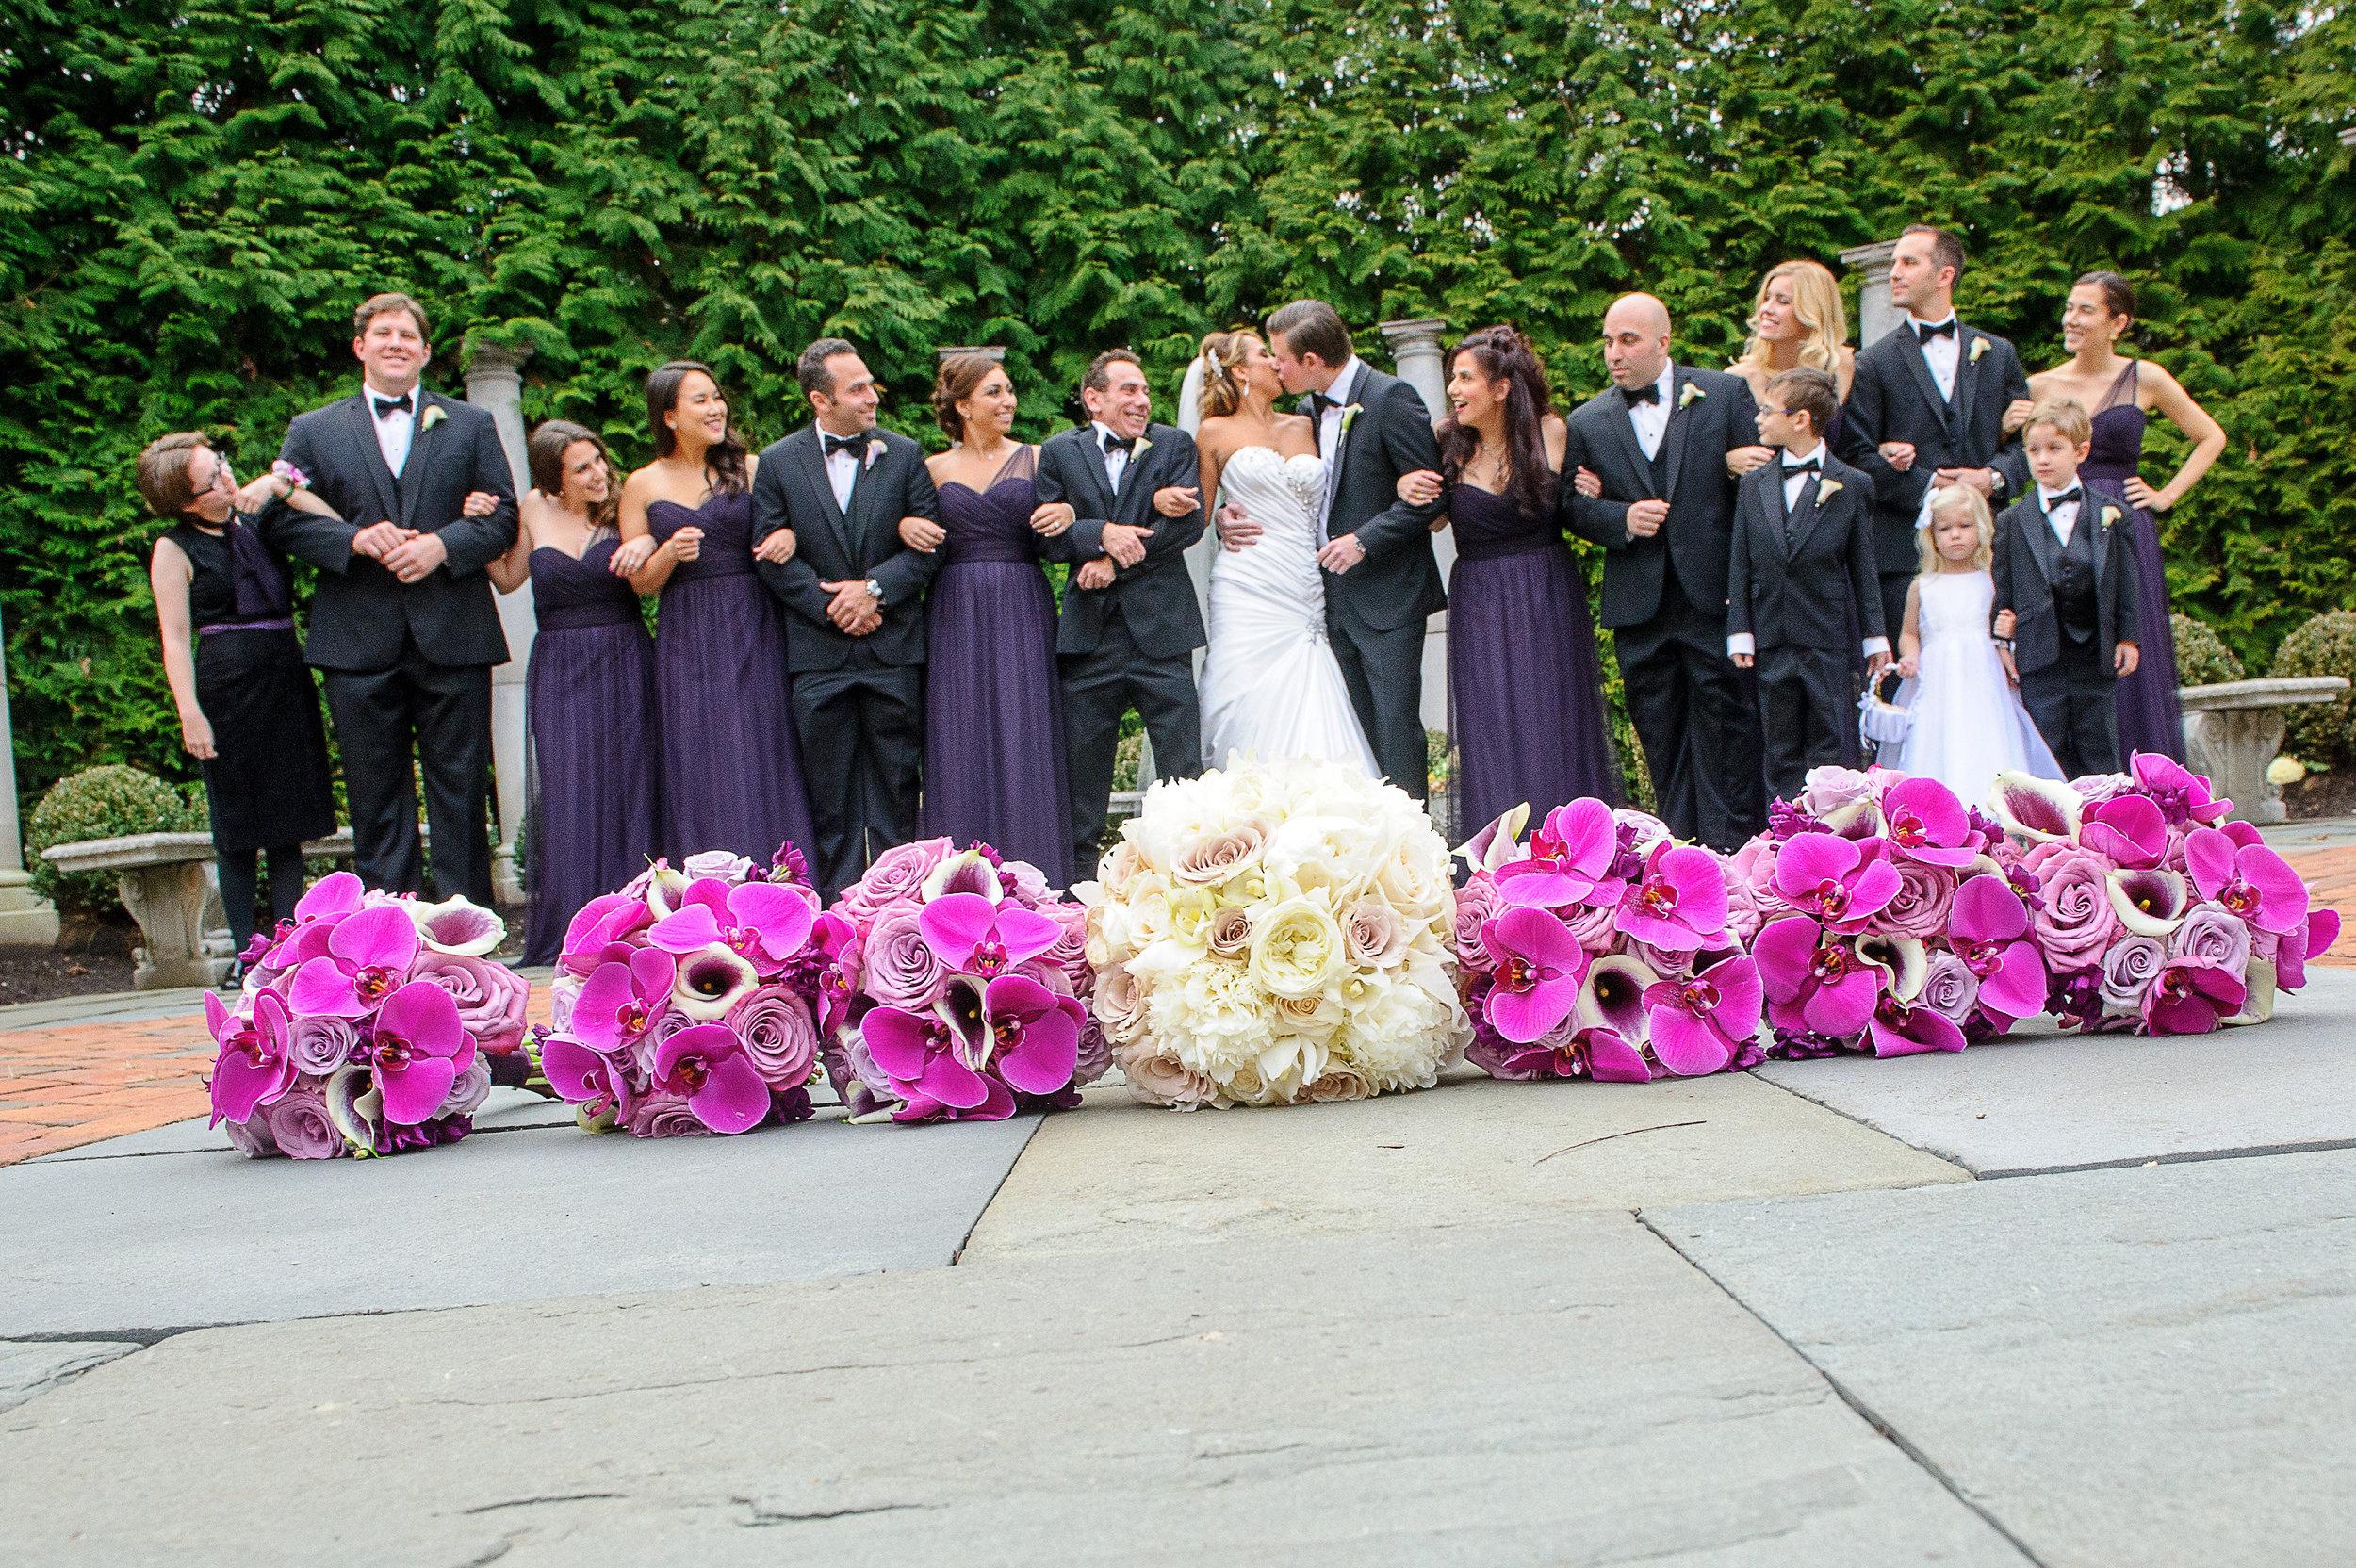 Ceci_New_York_Custom_Invitation_ New_Jersey_Wedding_Luxury_Personalized_Ceci_Style_Bride_Foil_Stamping98.JPG